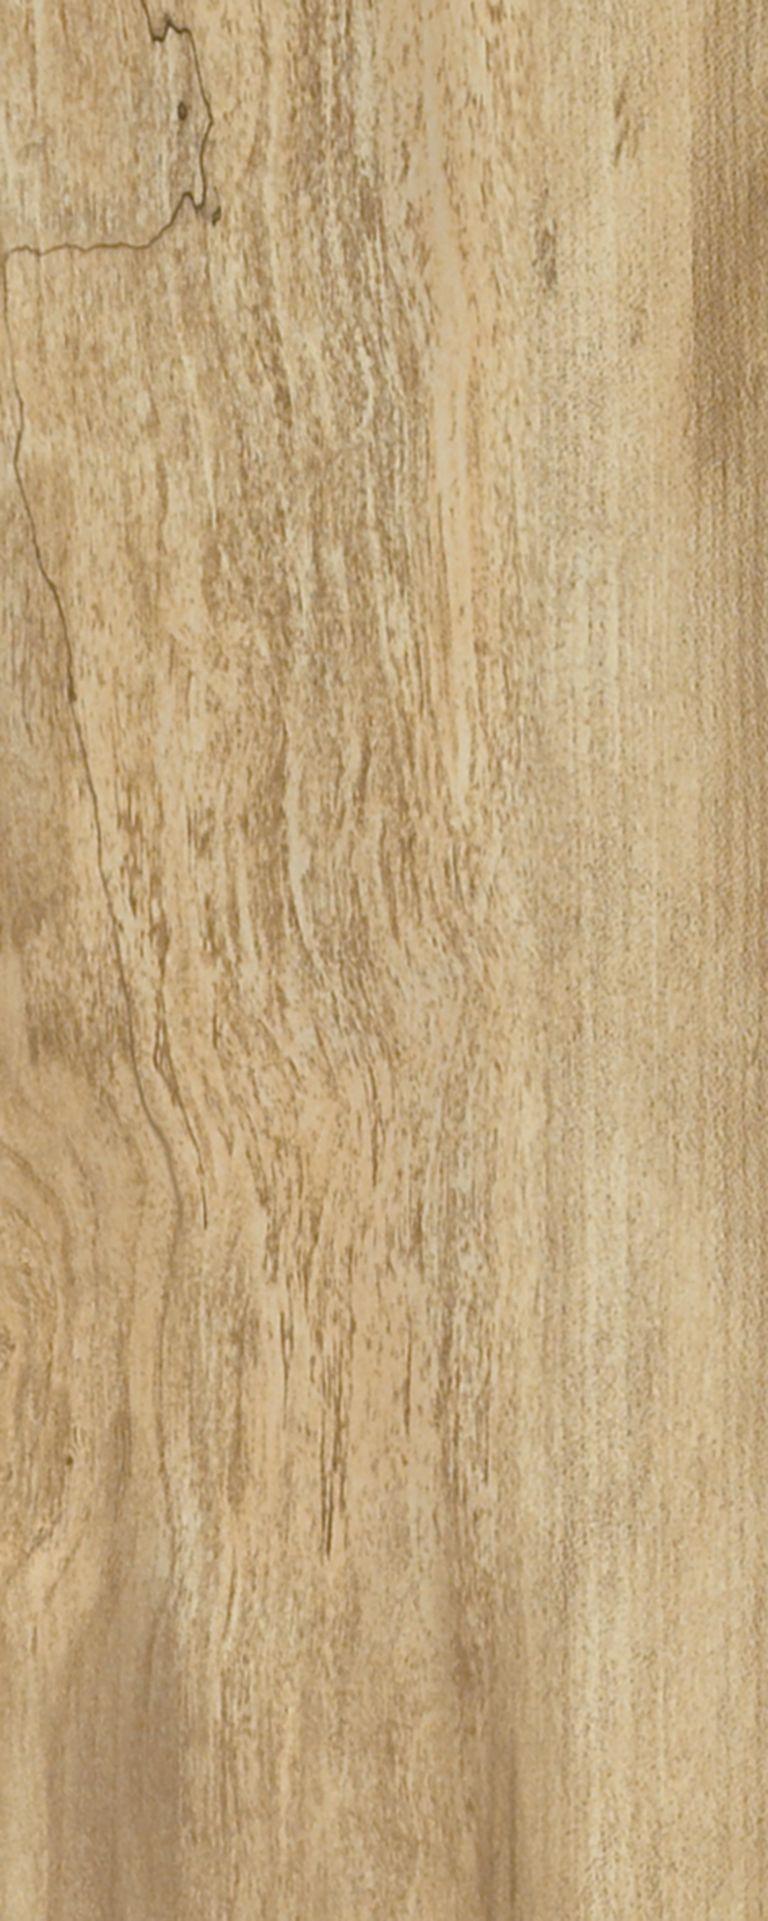 Flaxen Maple Laminate L4002